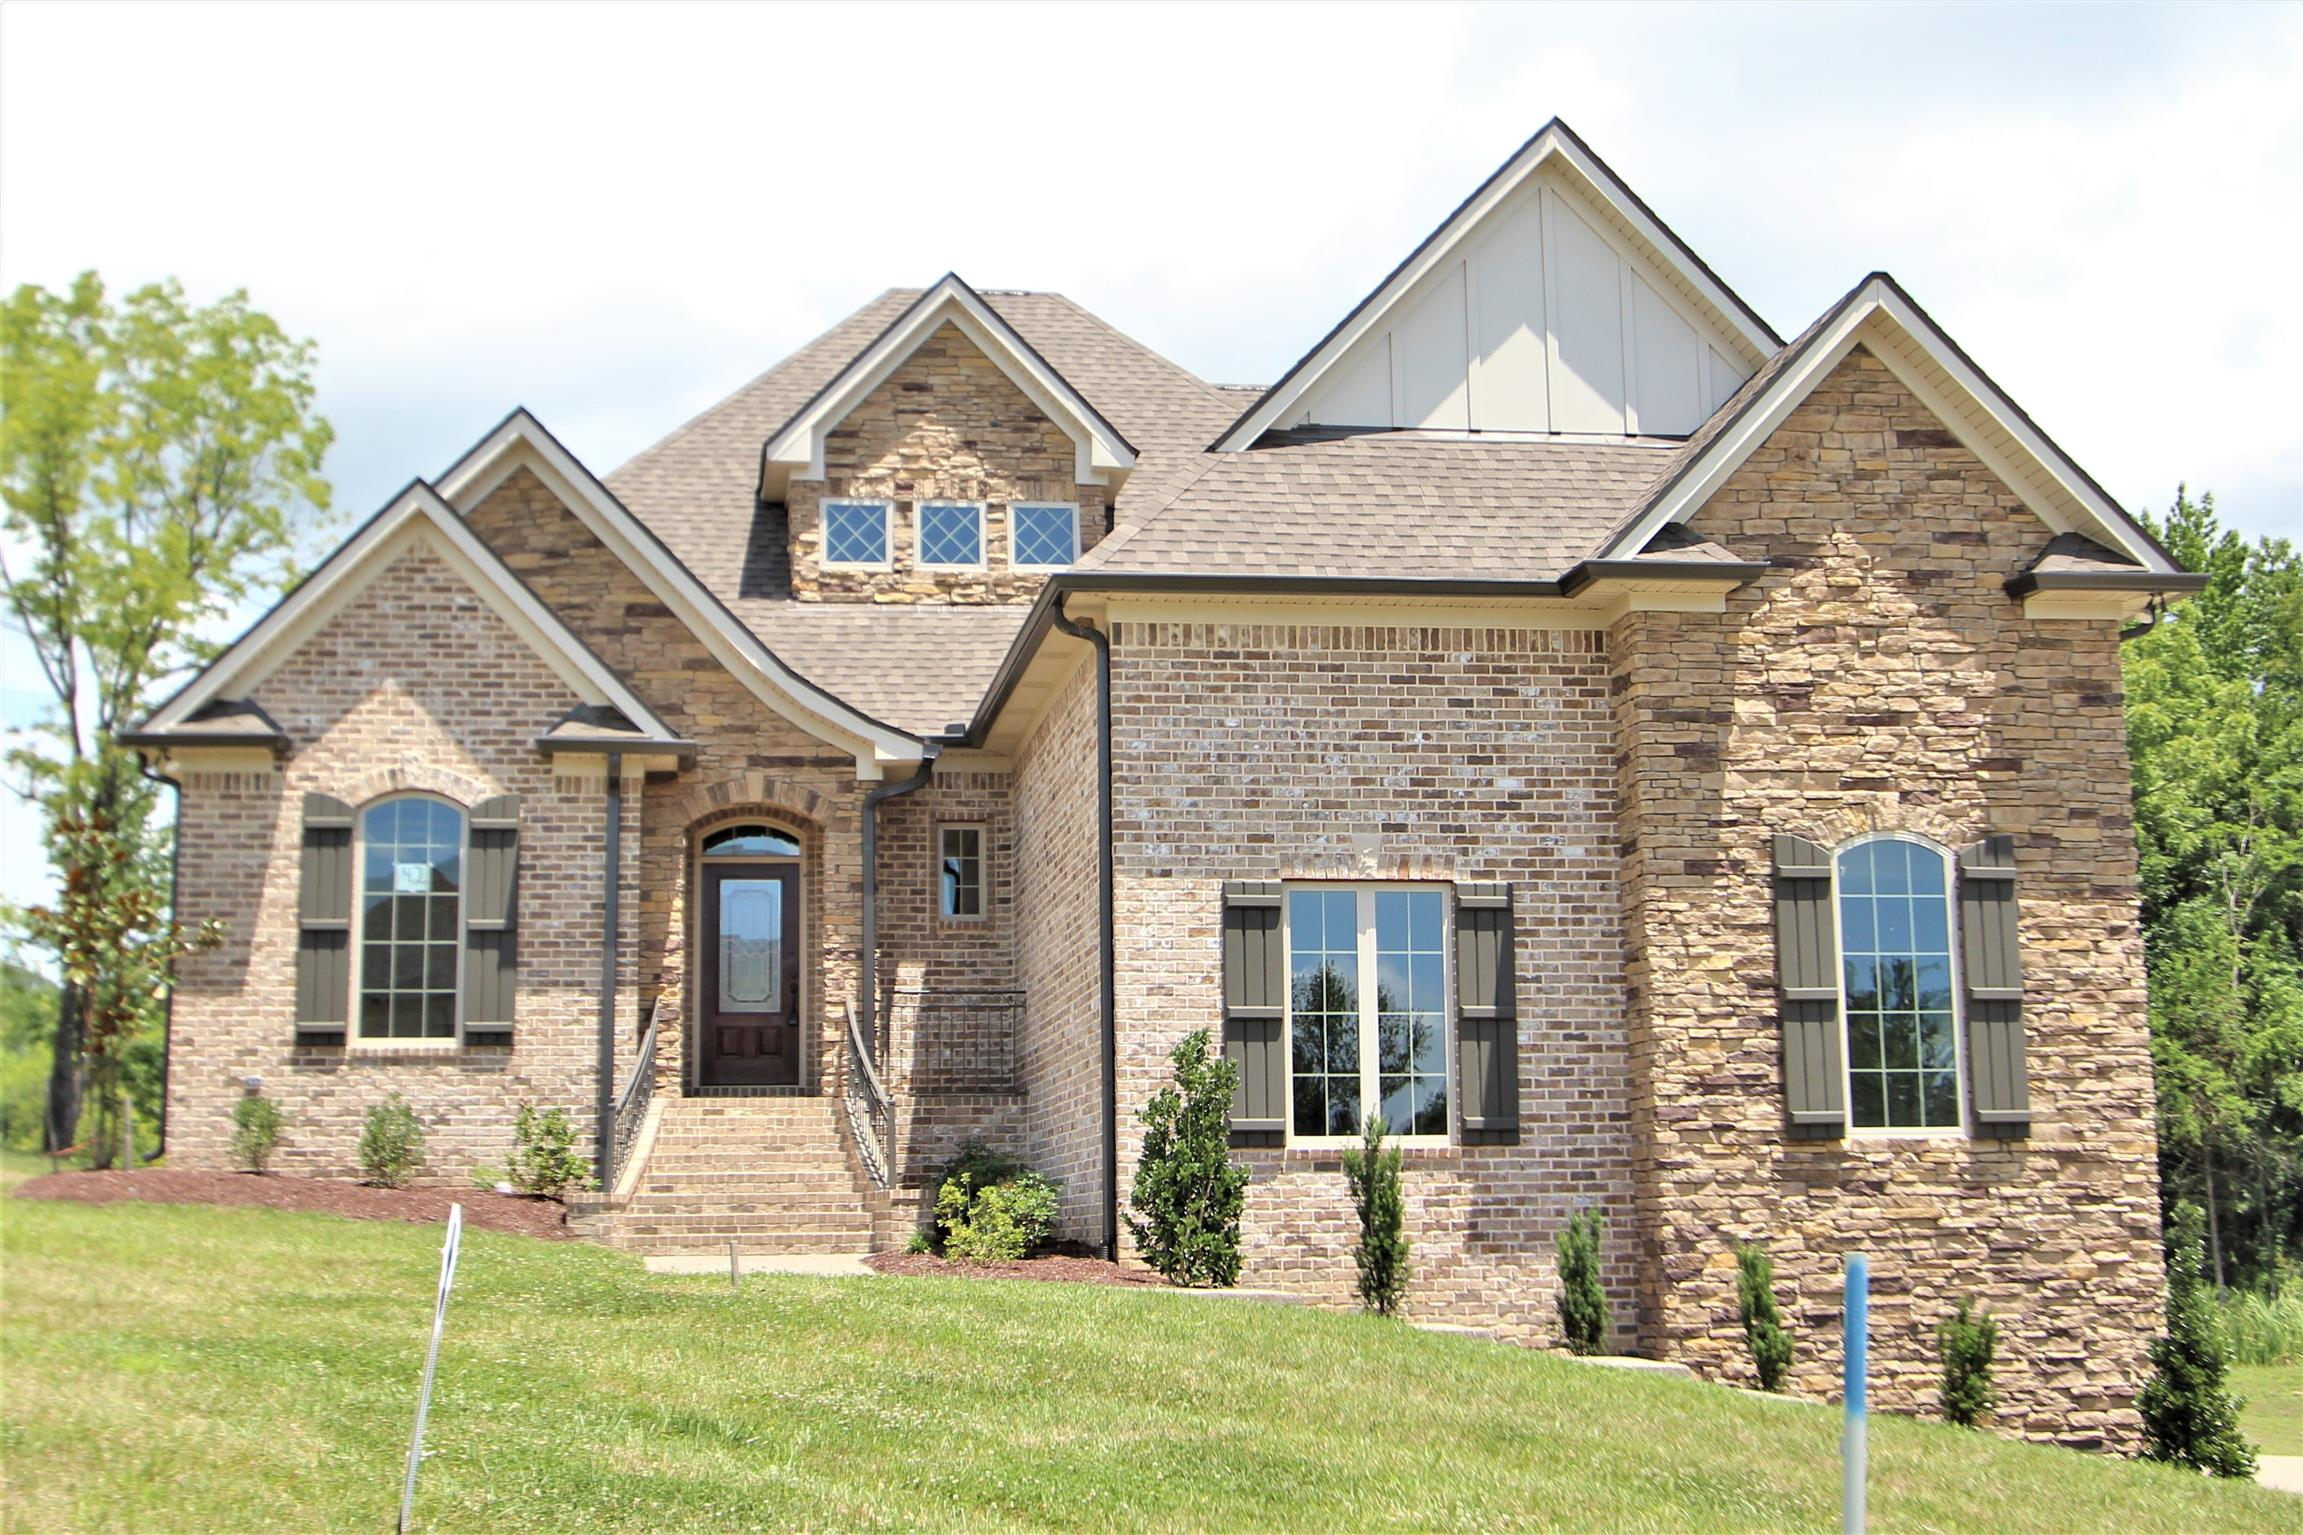 2727 Cherrydale Dr #42, Lebanon, TN 37087 - Lebanon, TN real estate listing